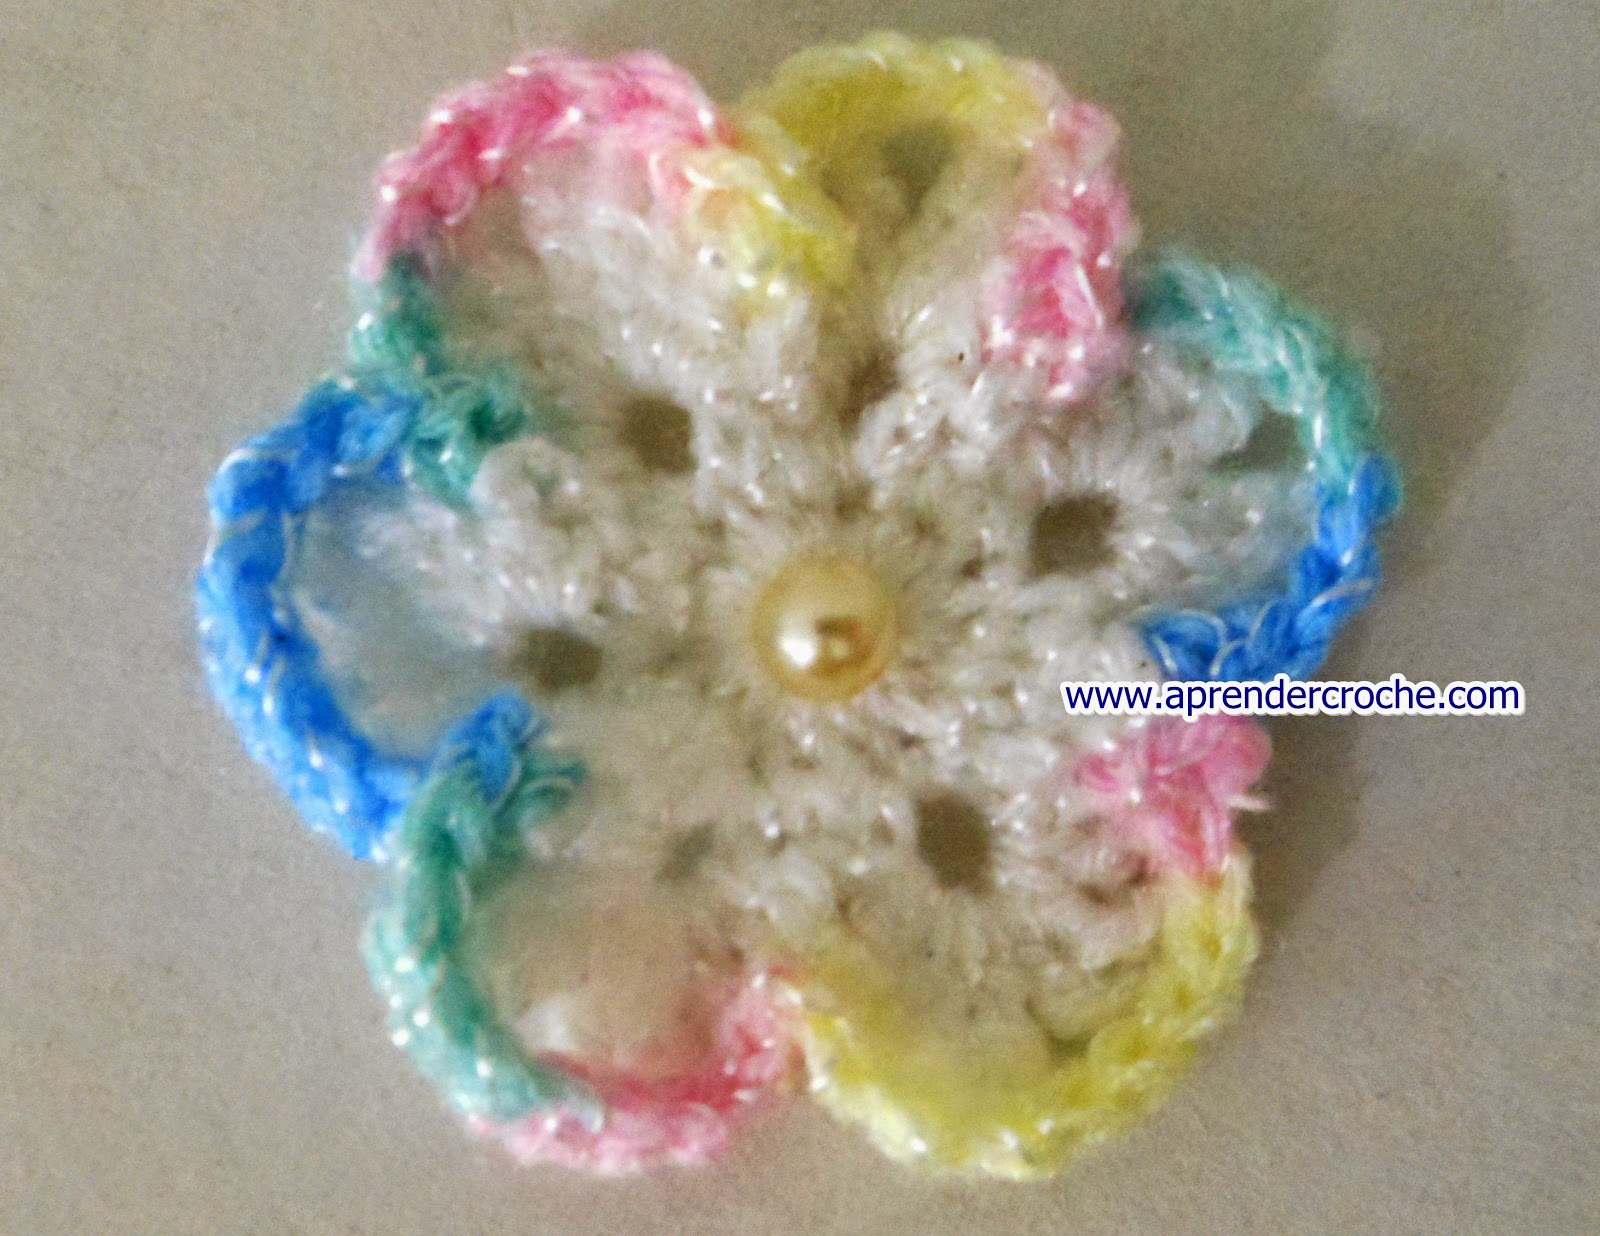 aprender croche flores inverno baby inverno bebê pantufas dvd video-aulas gratis loja curso de croche frete gratis